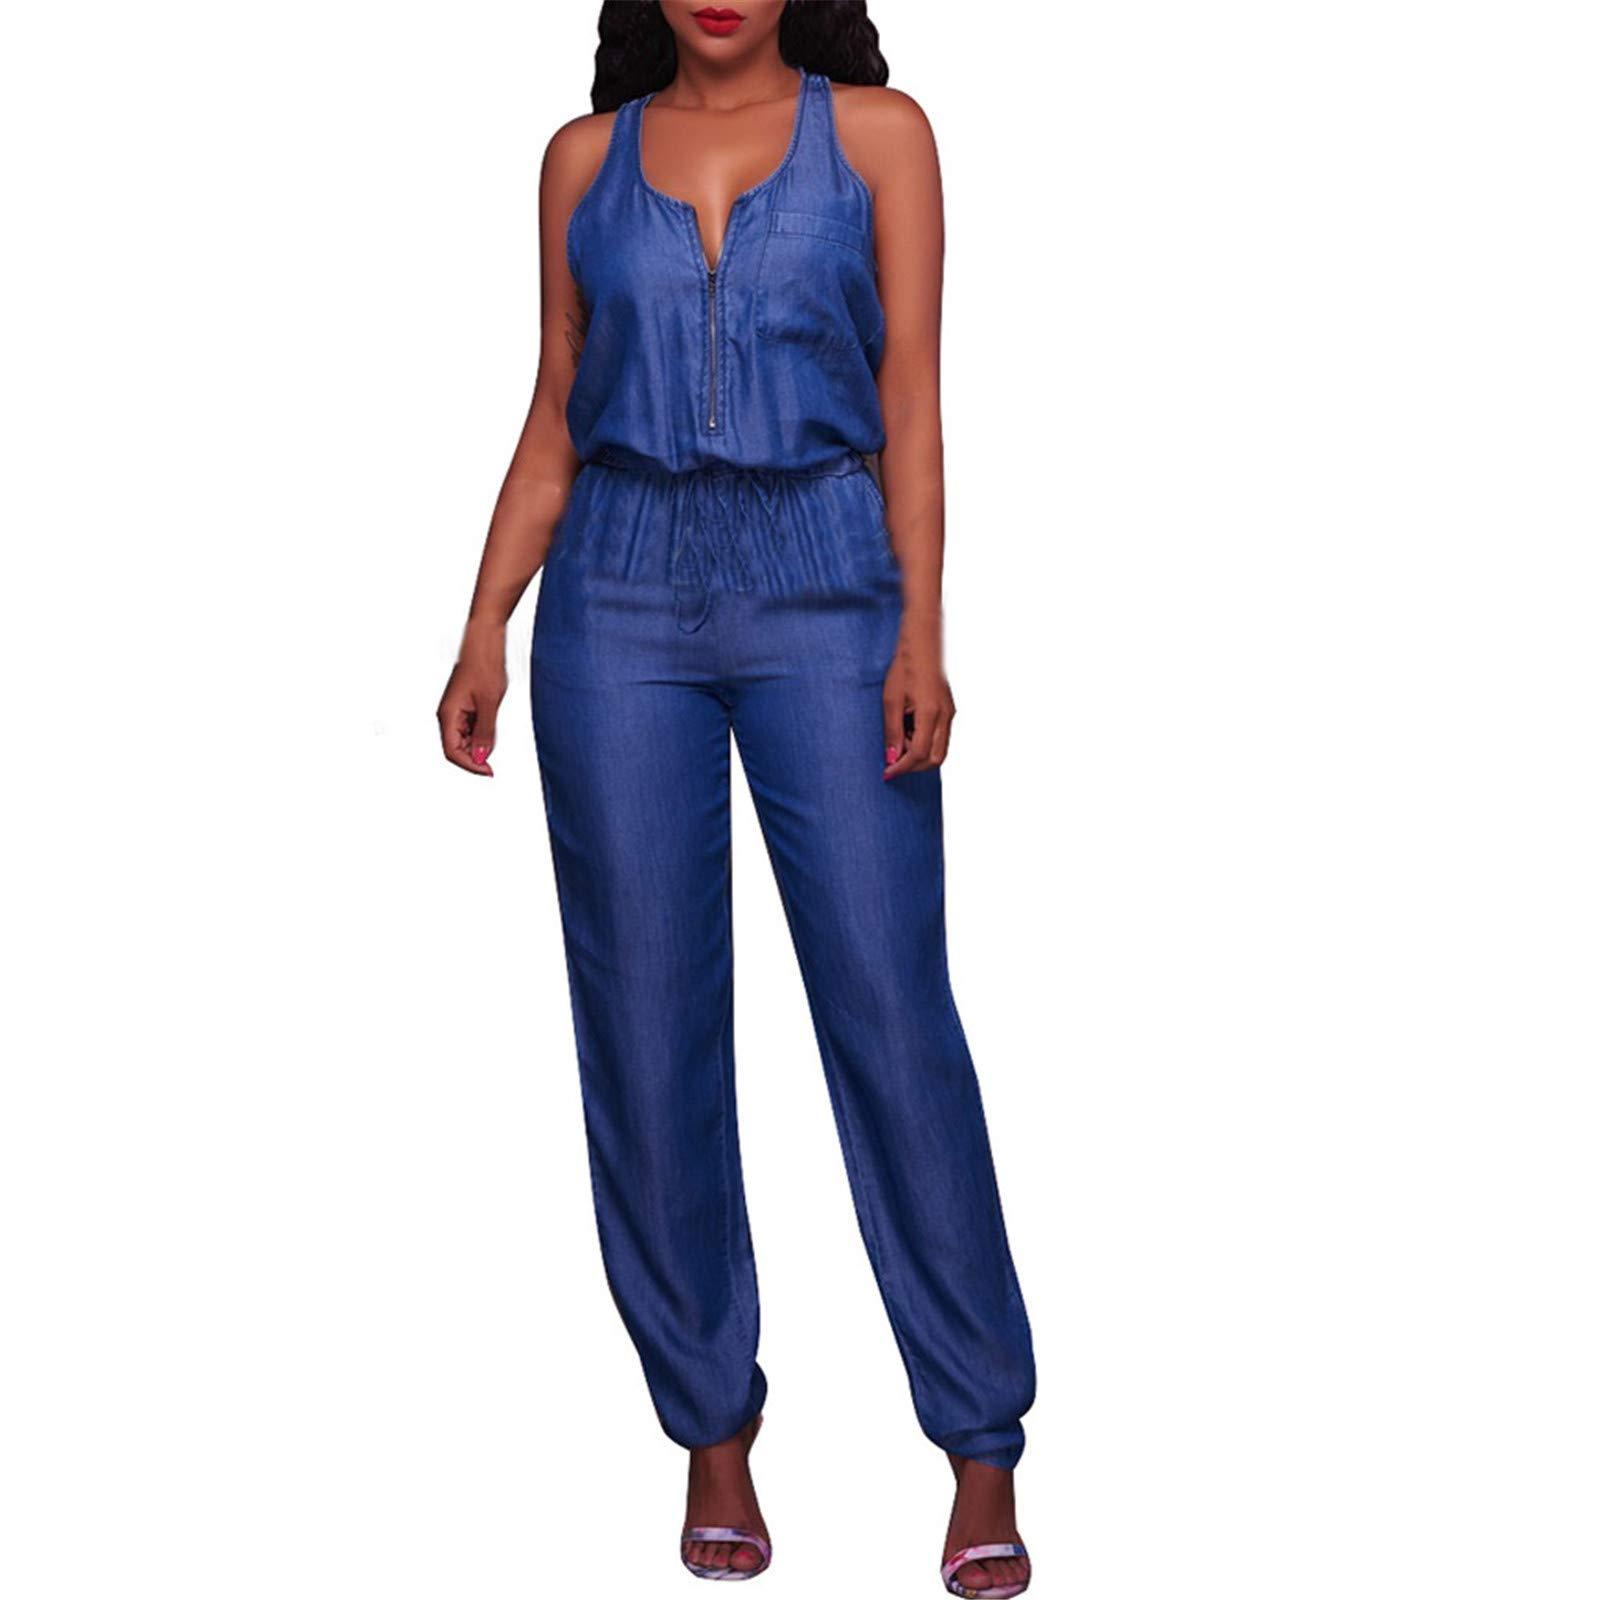 Thenxin Denim Jumpsuit Zipper Up V Neck Sleeveless Romper Elastic Waist Beam Foot Playsuit(Blue,L)